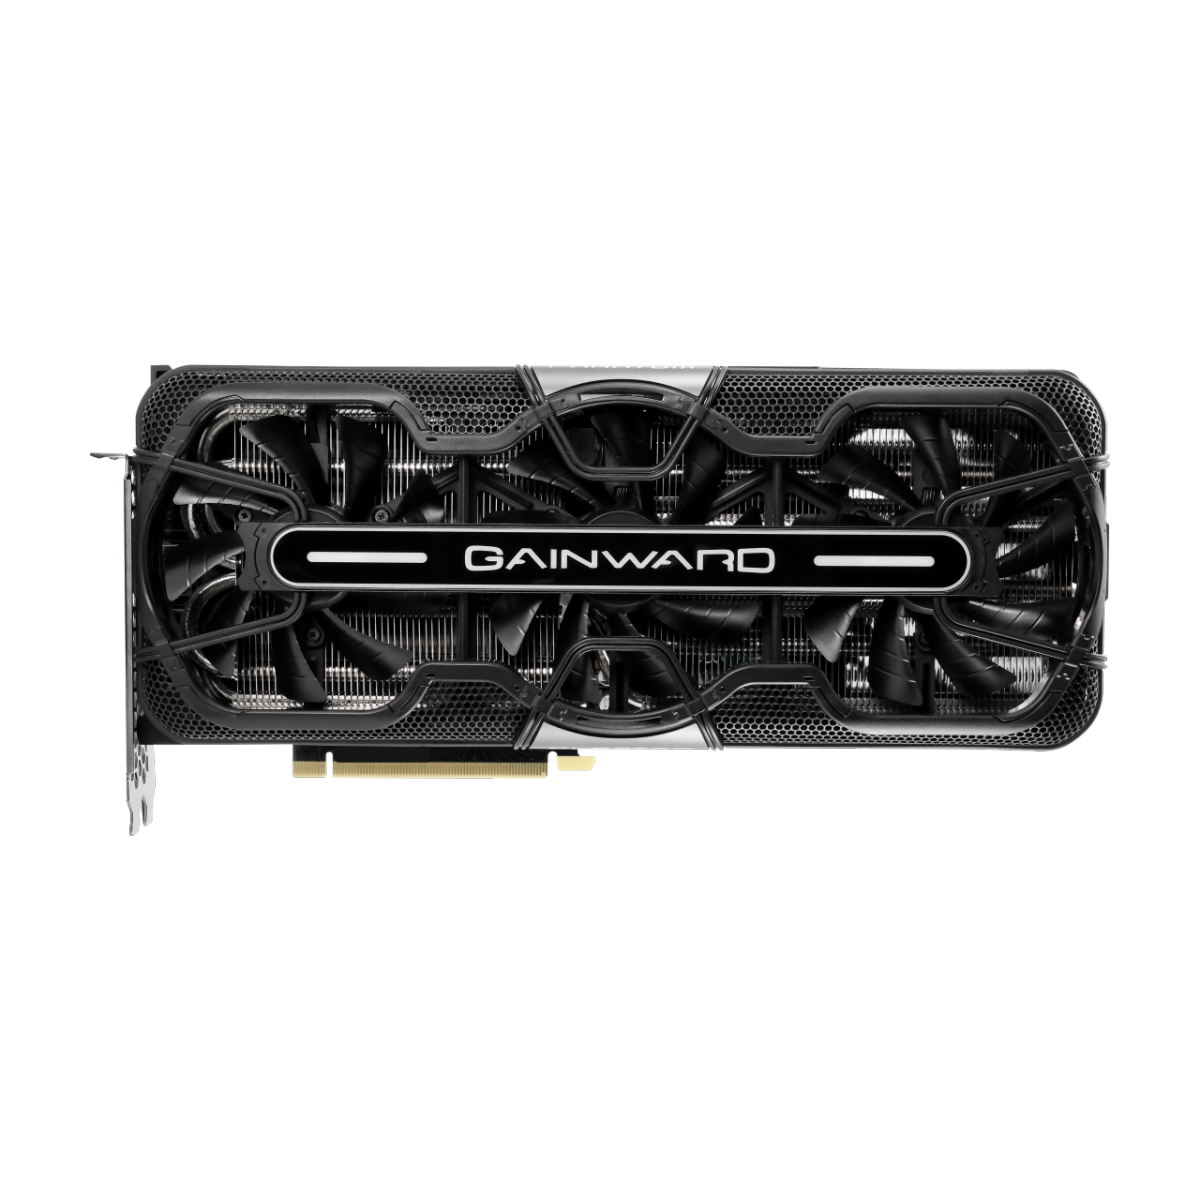 Placa de Vídeo Gainward, GeForce RTX 3080 Phantom, 10GB, GDDR6, 320Bit, NED3080U19IA-1020P